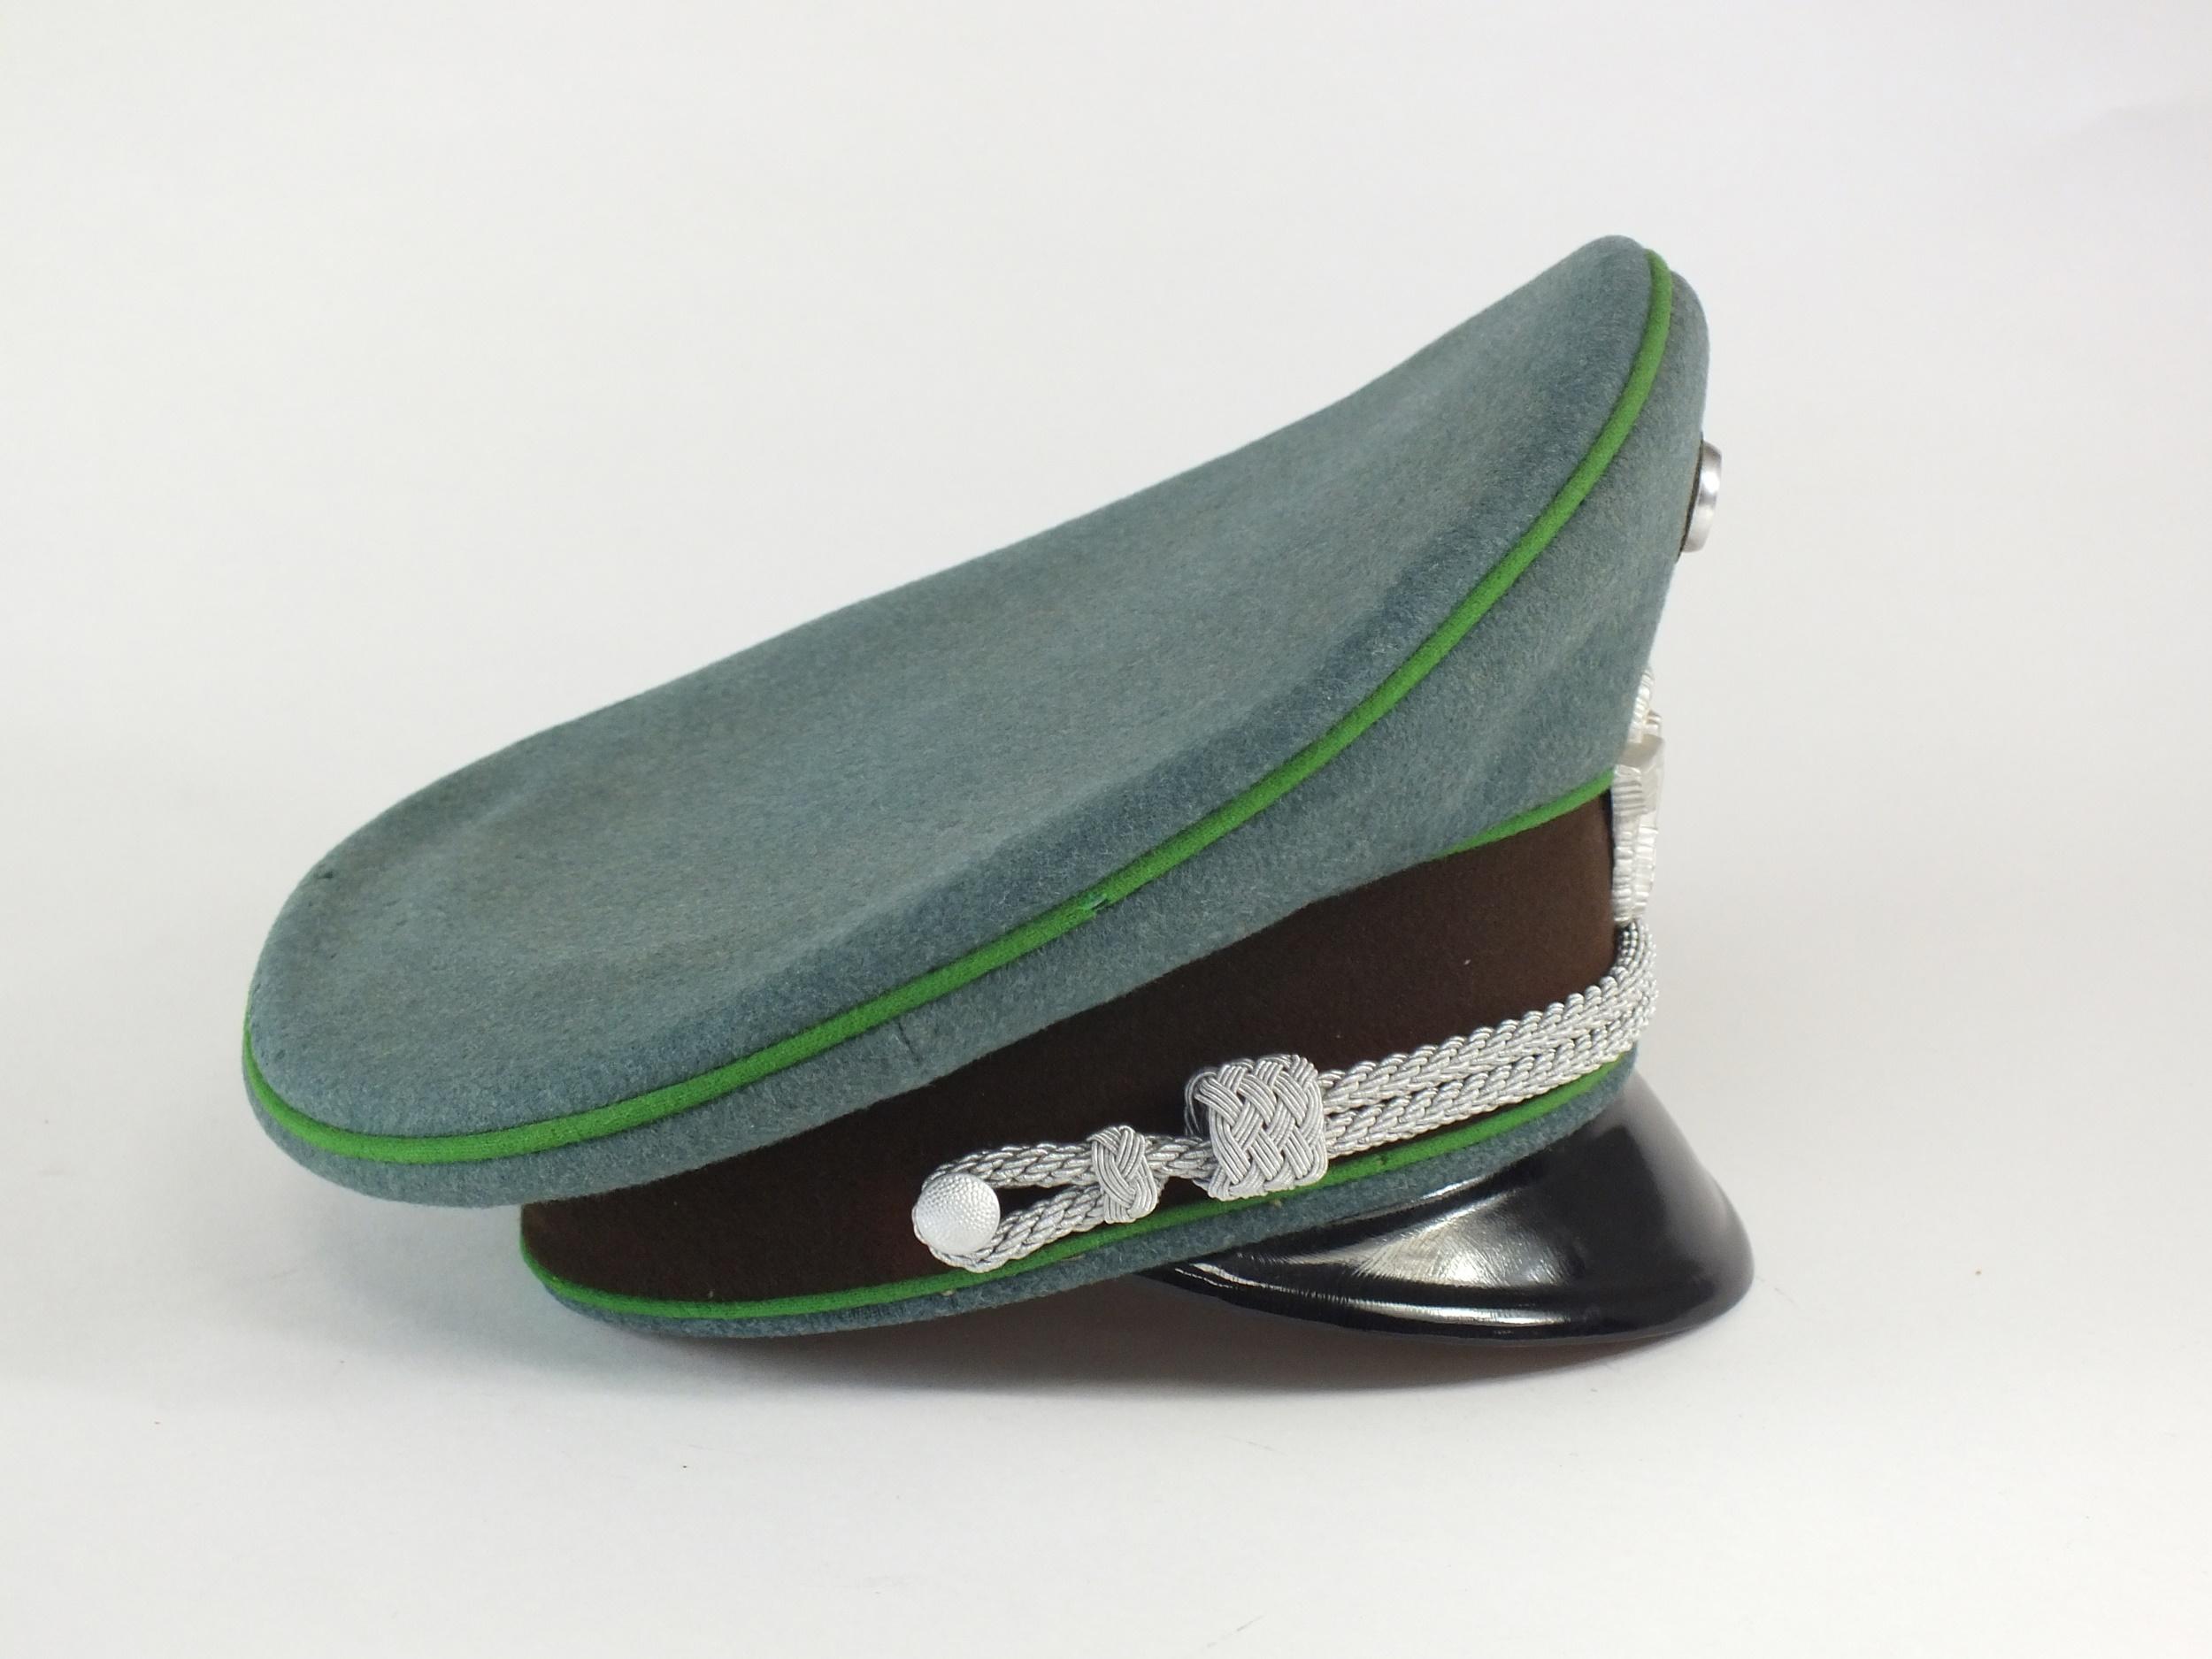 A German Third Reich Schutzpolizei (Protection Police) Officer's visor cap - Image 4 of 7